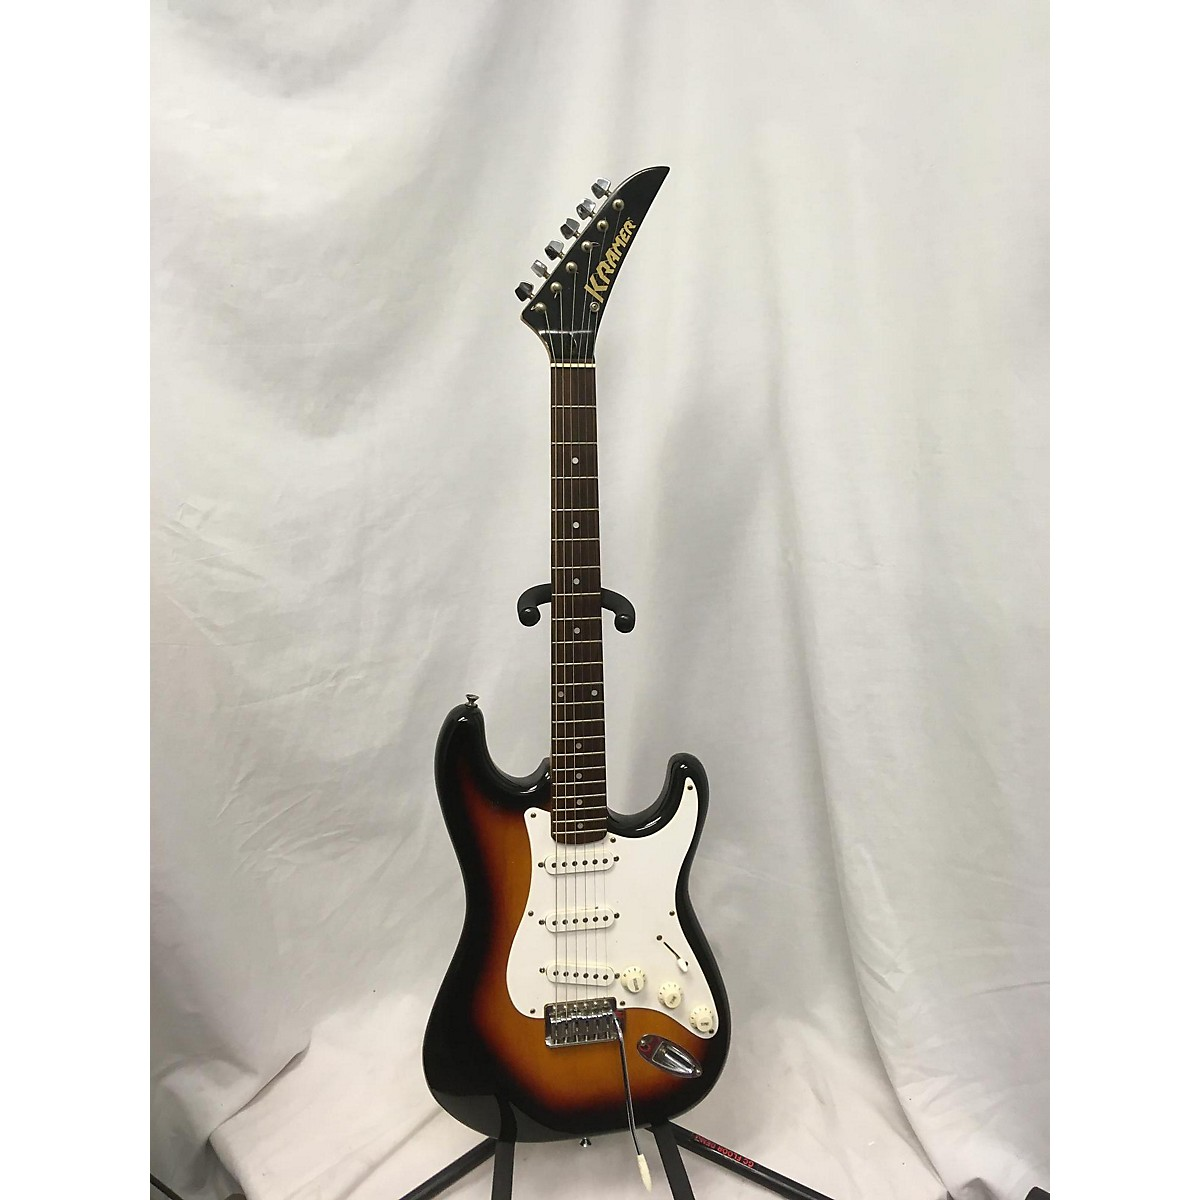 Kramer KS400SB Solid Body Electric Guitar